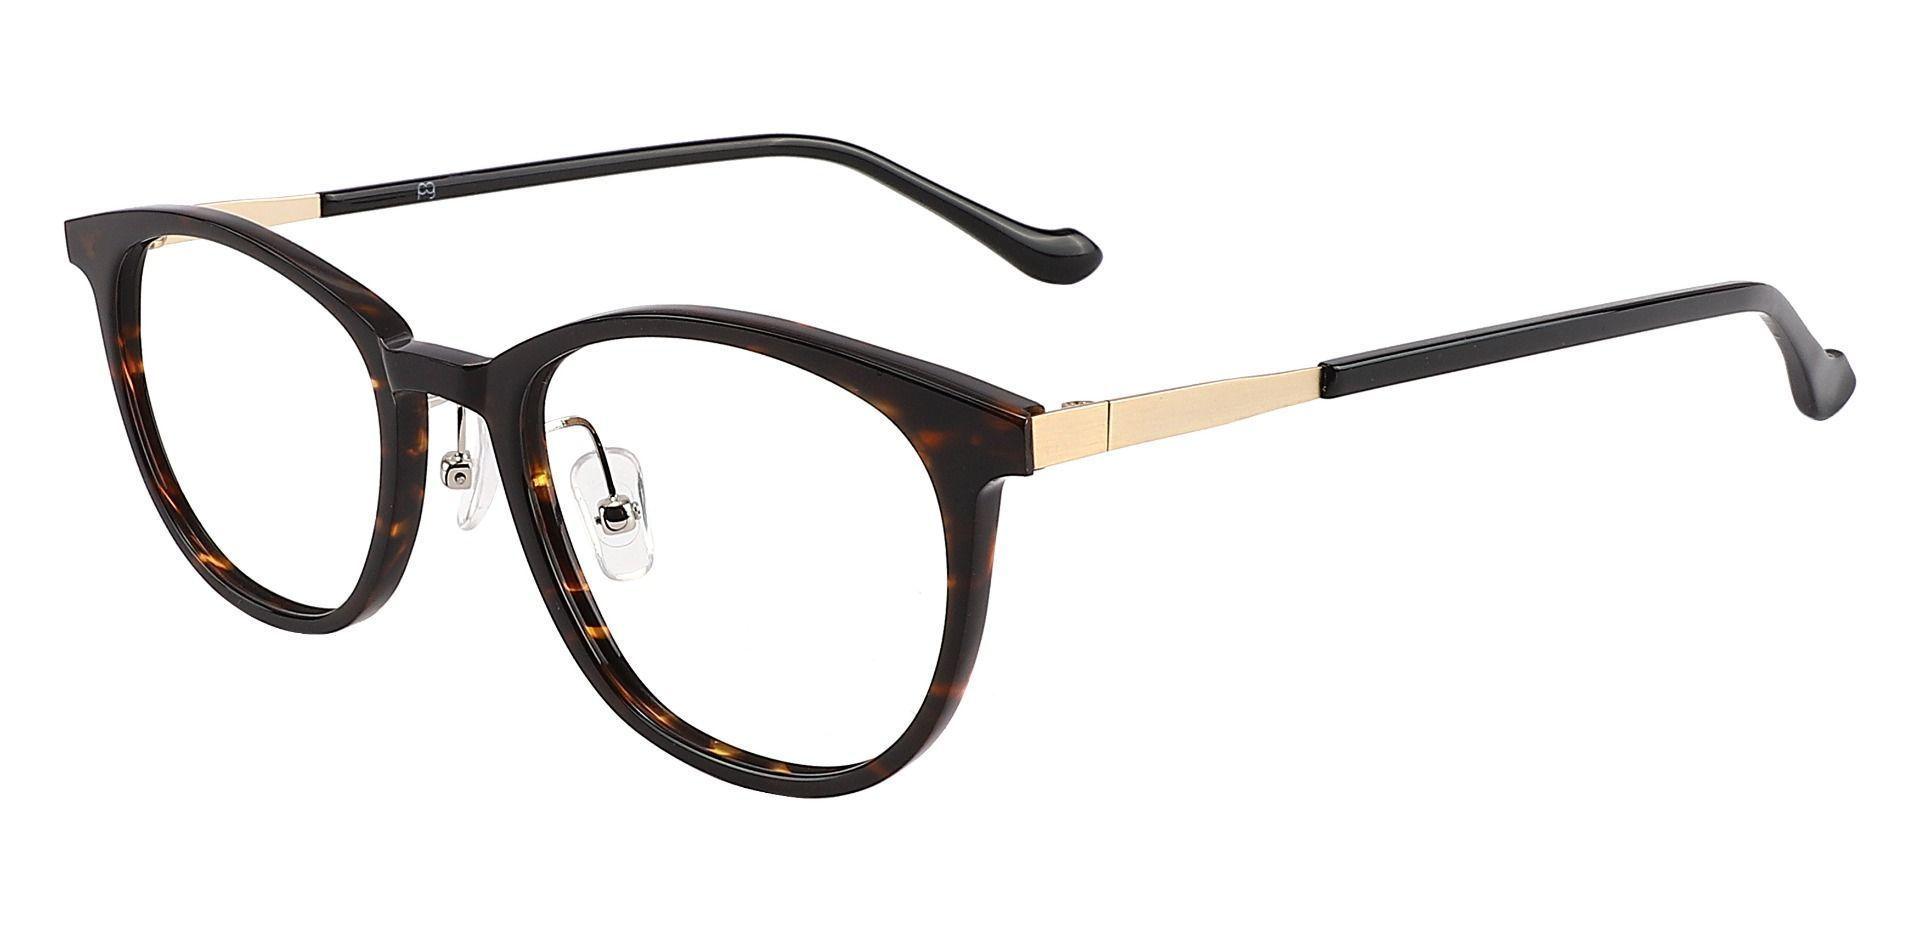 Midway Oval Prescription Glasses - Tortoise